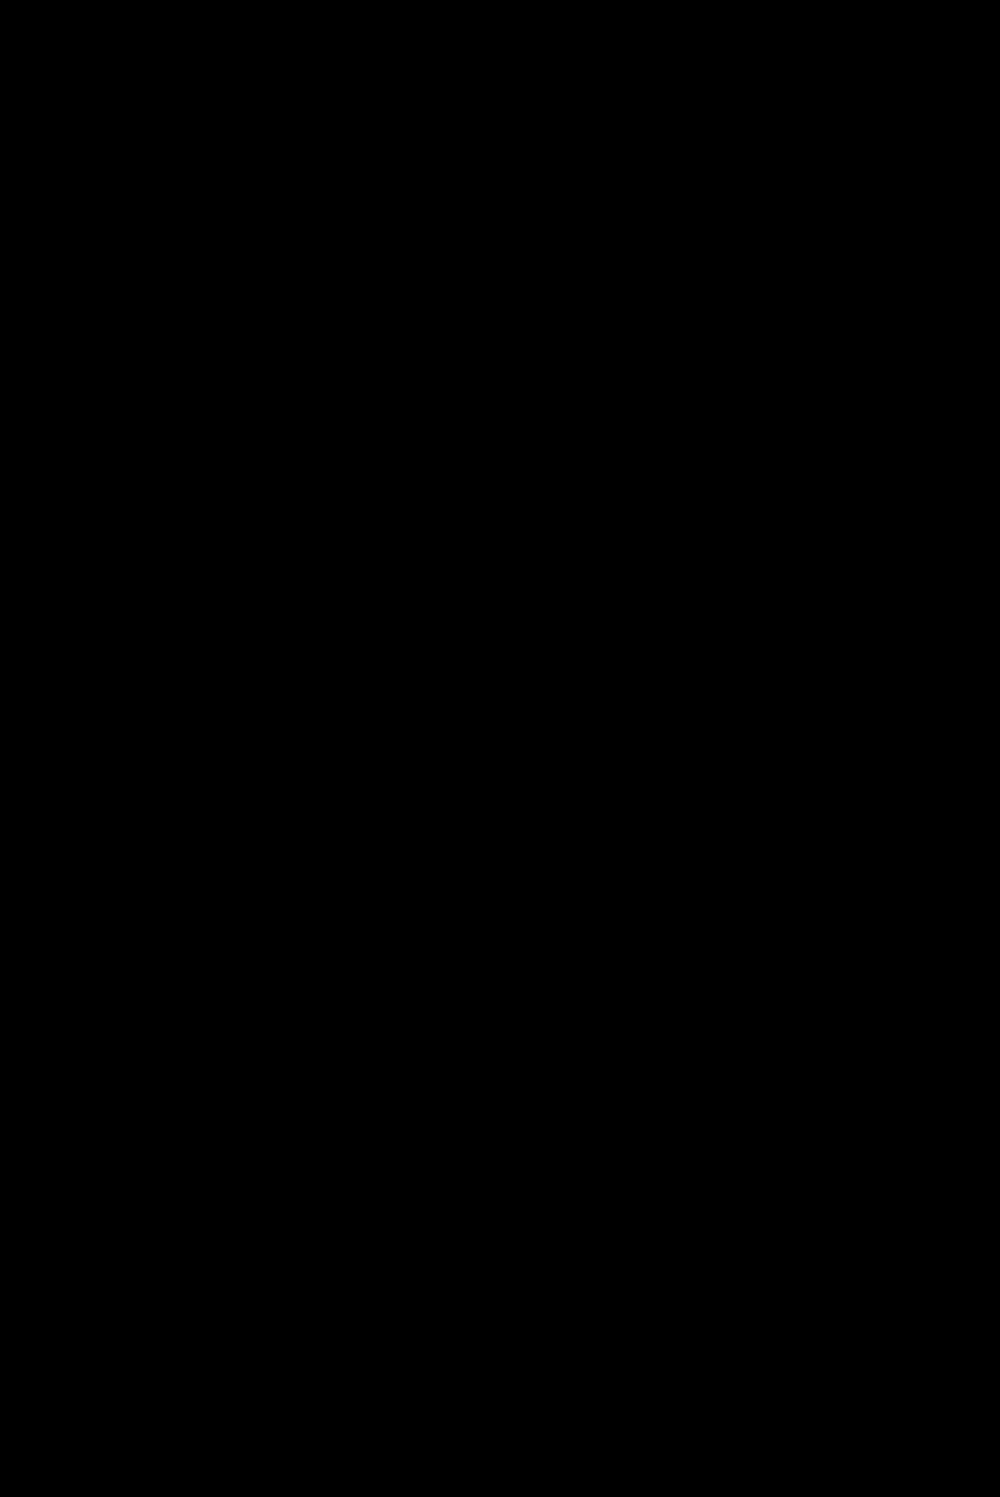 Dibujo De Galleta De Pan De Jengibre Para Colorear Ultra